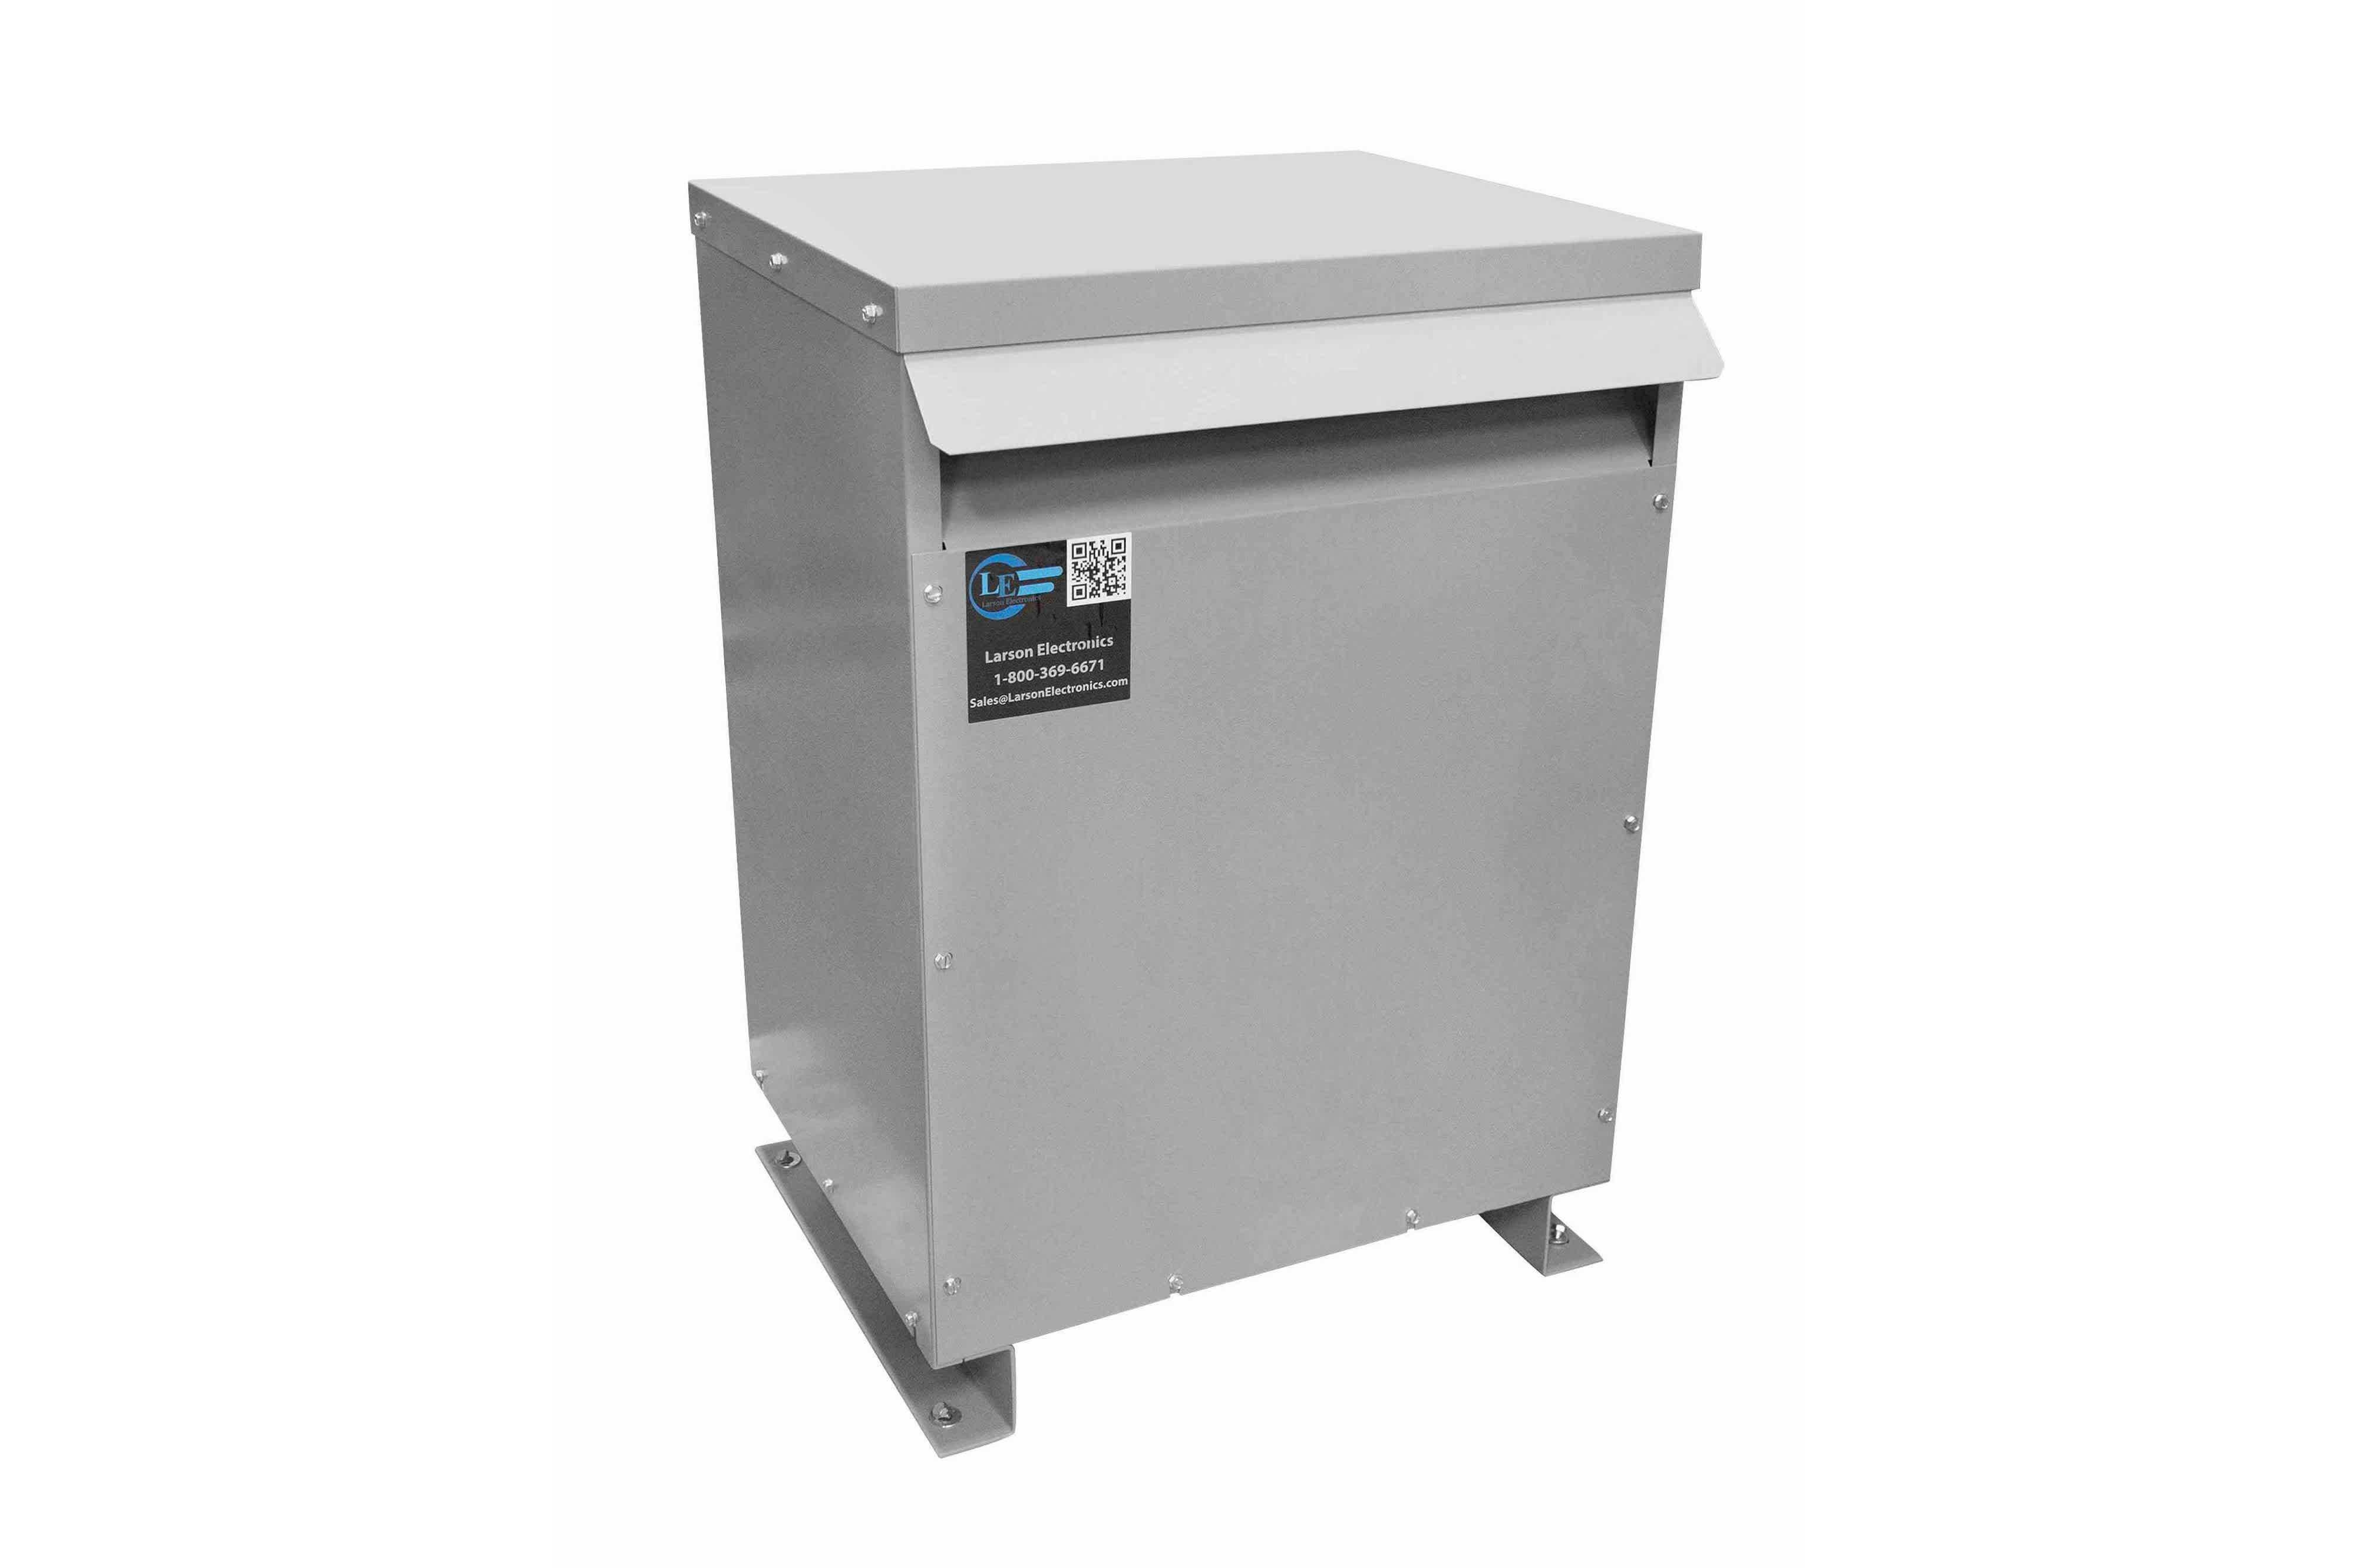 50 kVA 3PH DOE Transformer, 575V Delta Primary, 415Y/240 Wye-N Secondary, N3R, Ventilated, 60 Hz